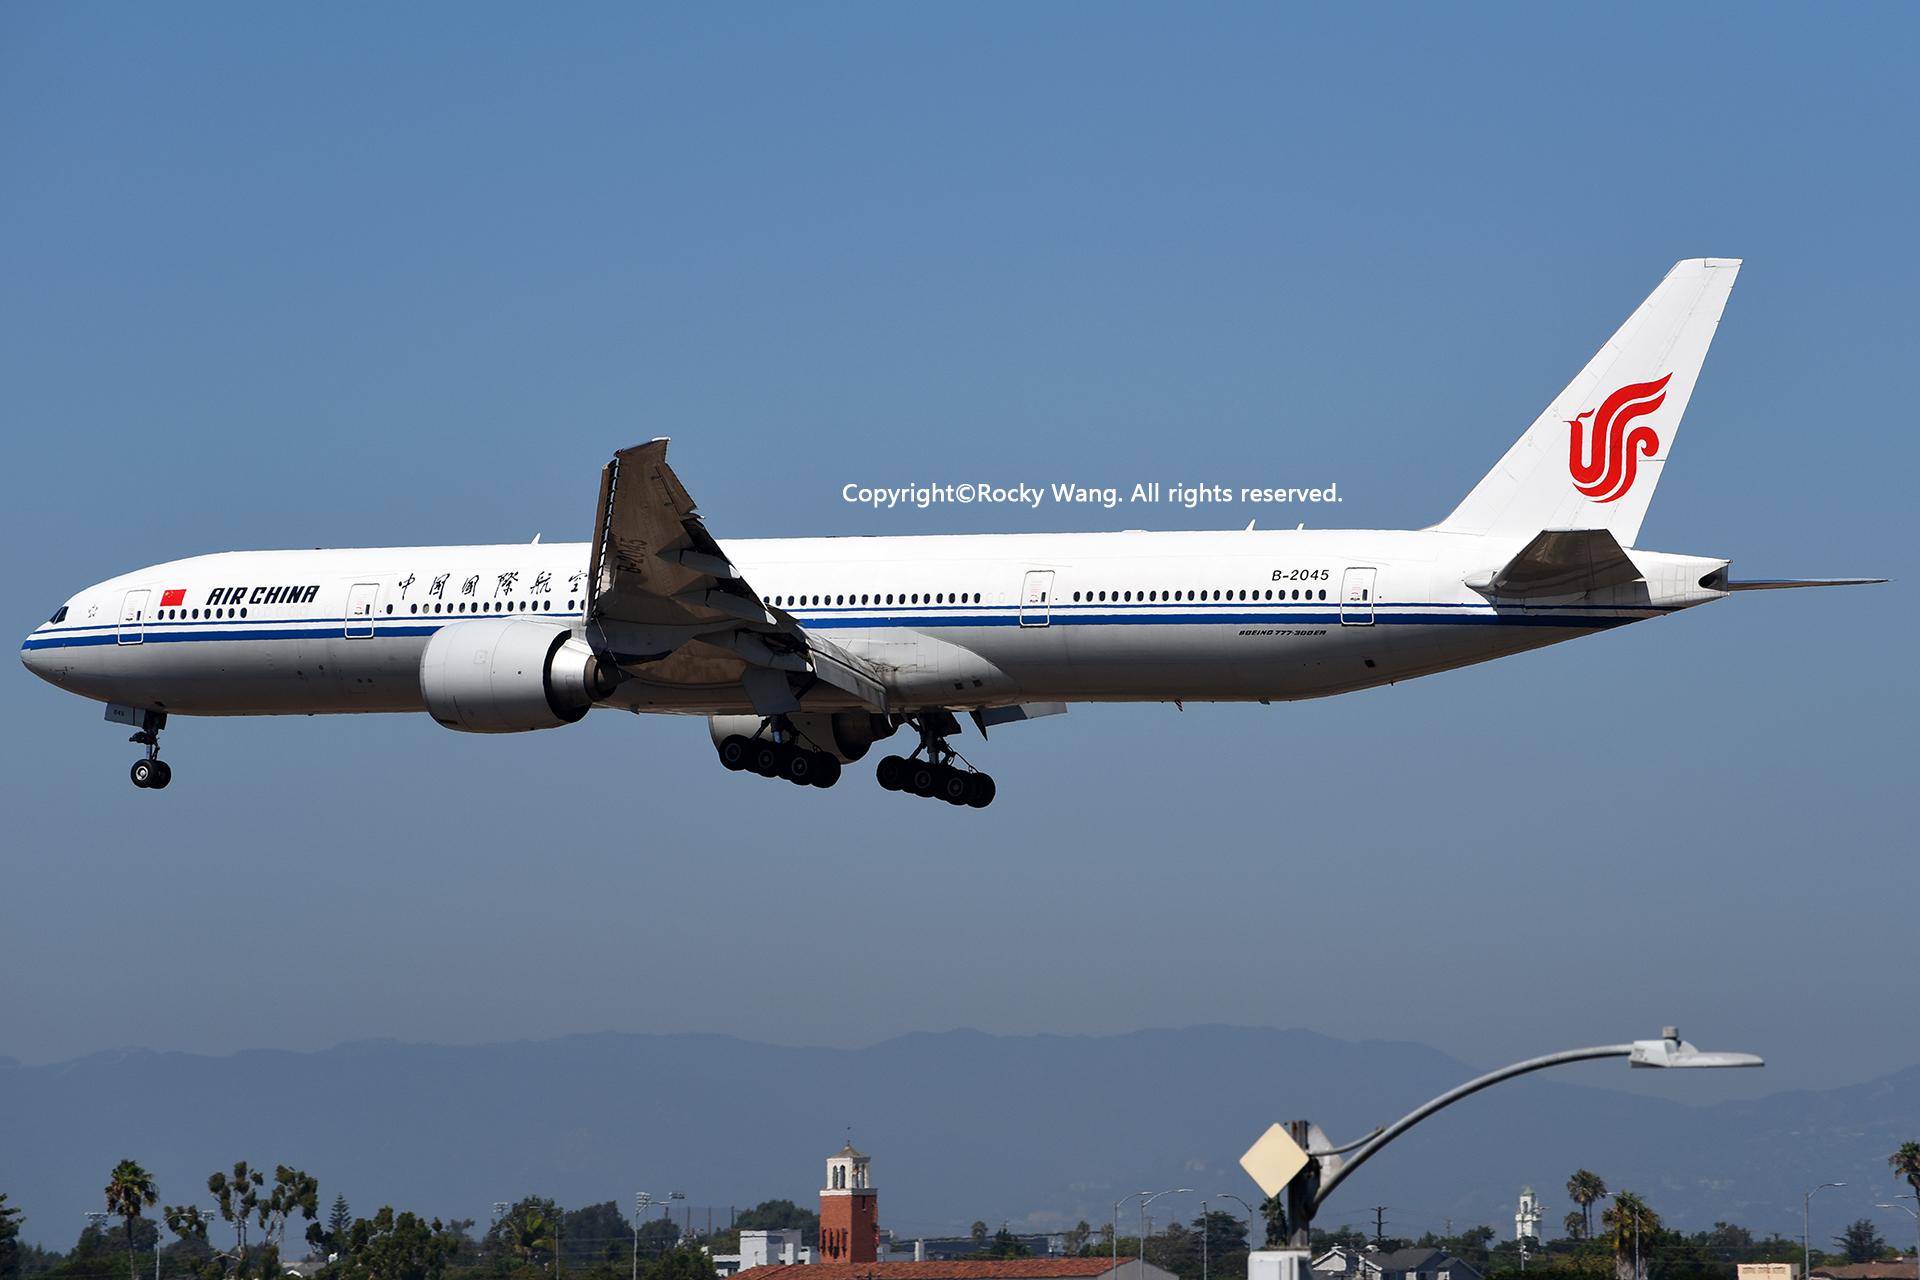 Re:[原创]居家了 批量处理老图 倾情奉献52家777 BOEING 777-39LER B-2045 Los Angeles Int'l Airport